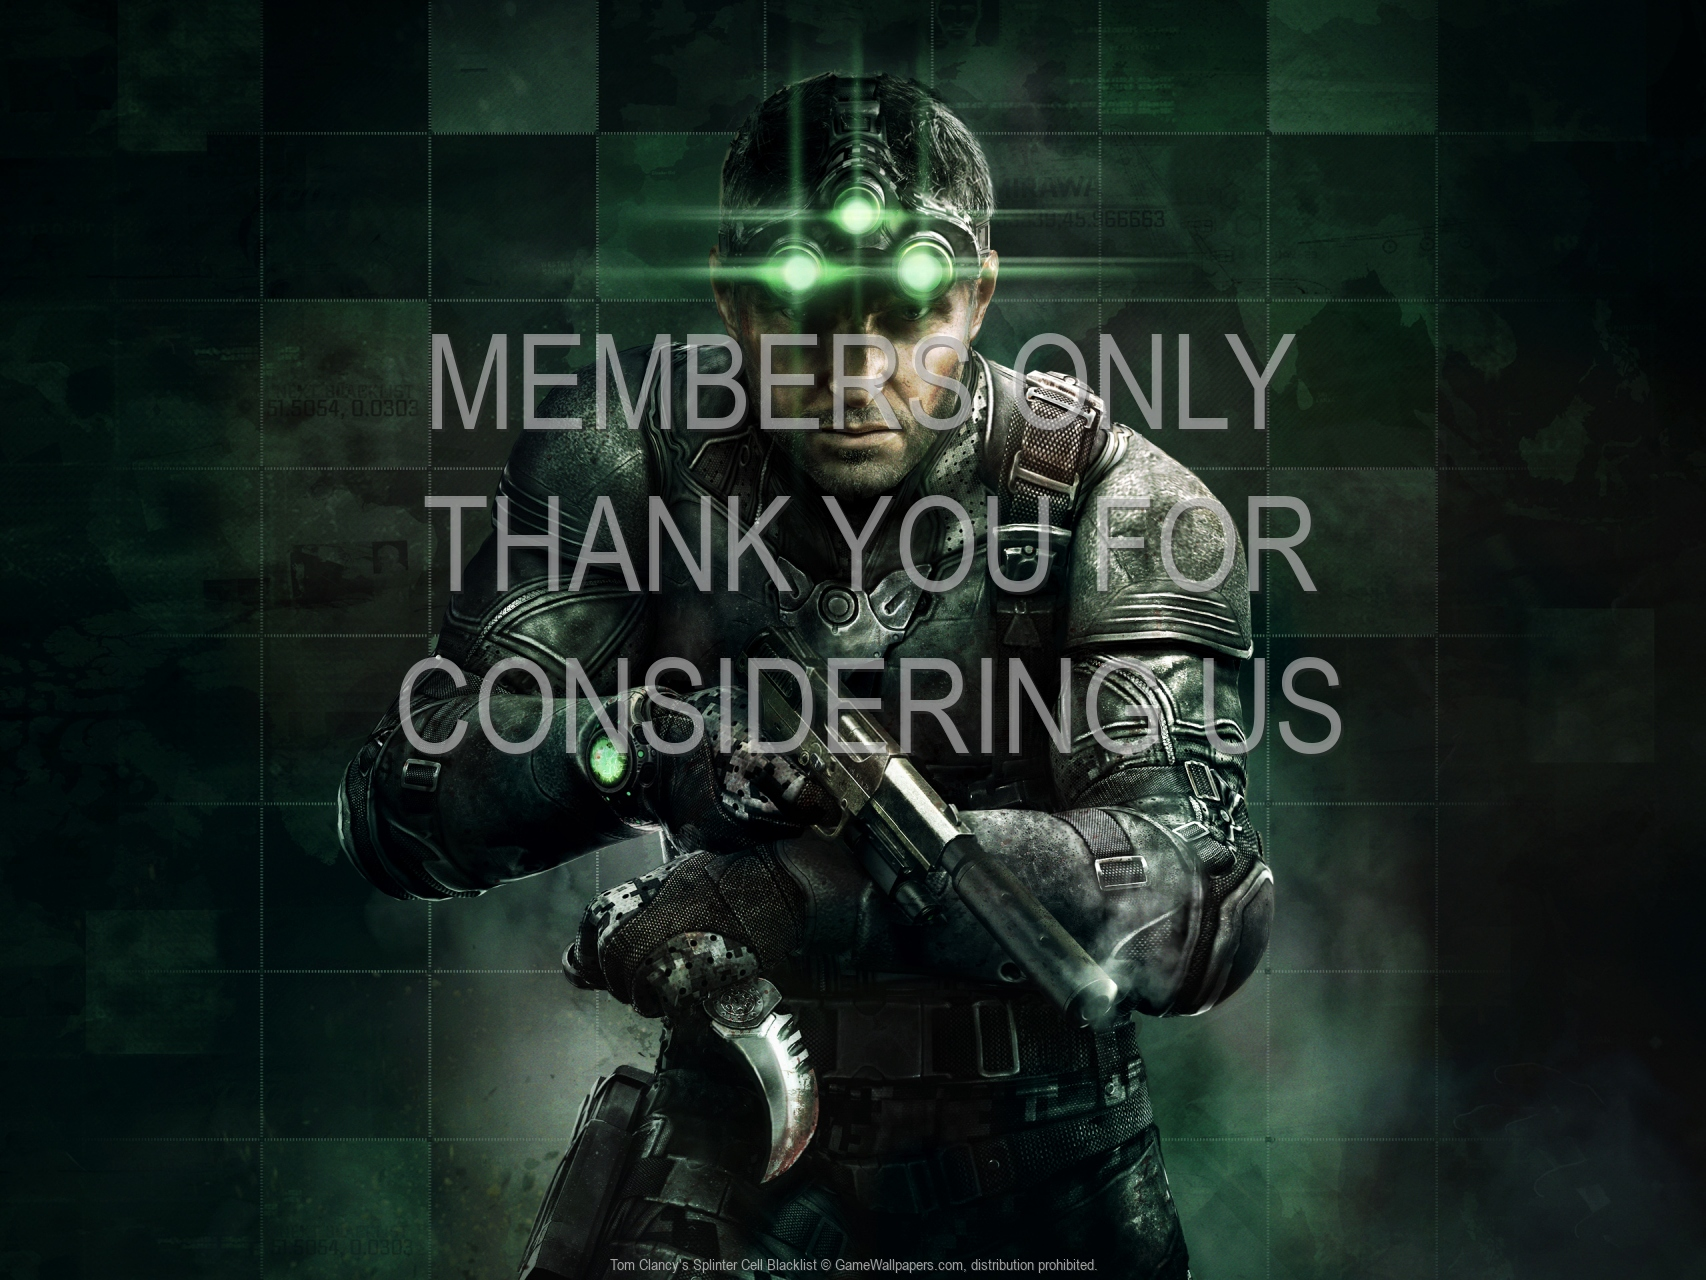 Tom Clancy's Splinter Cell: Blacklist 1920x1080 Handy Hintergrundbild 04